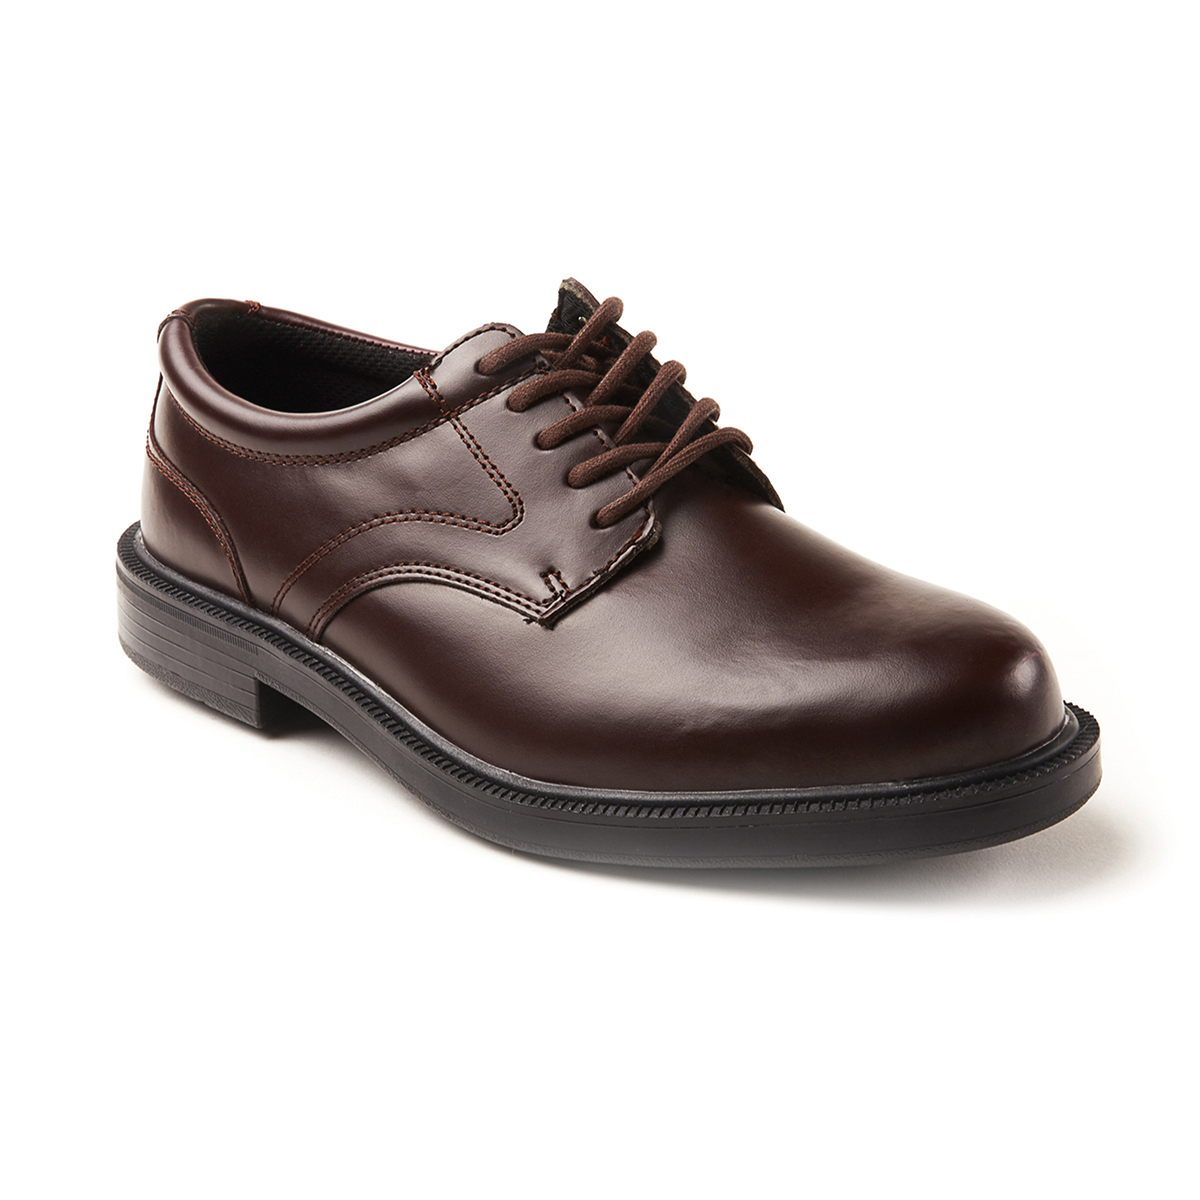 Deer Stags Men's Times Plain Toe Oxford Dress Shoe - Brown, 7.5